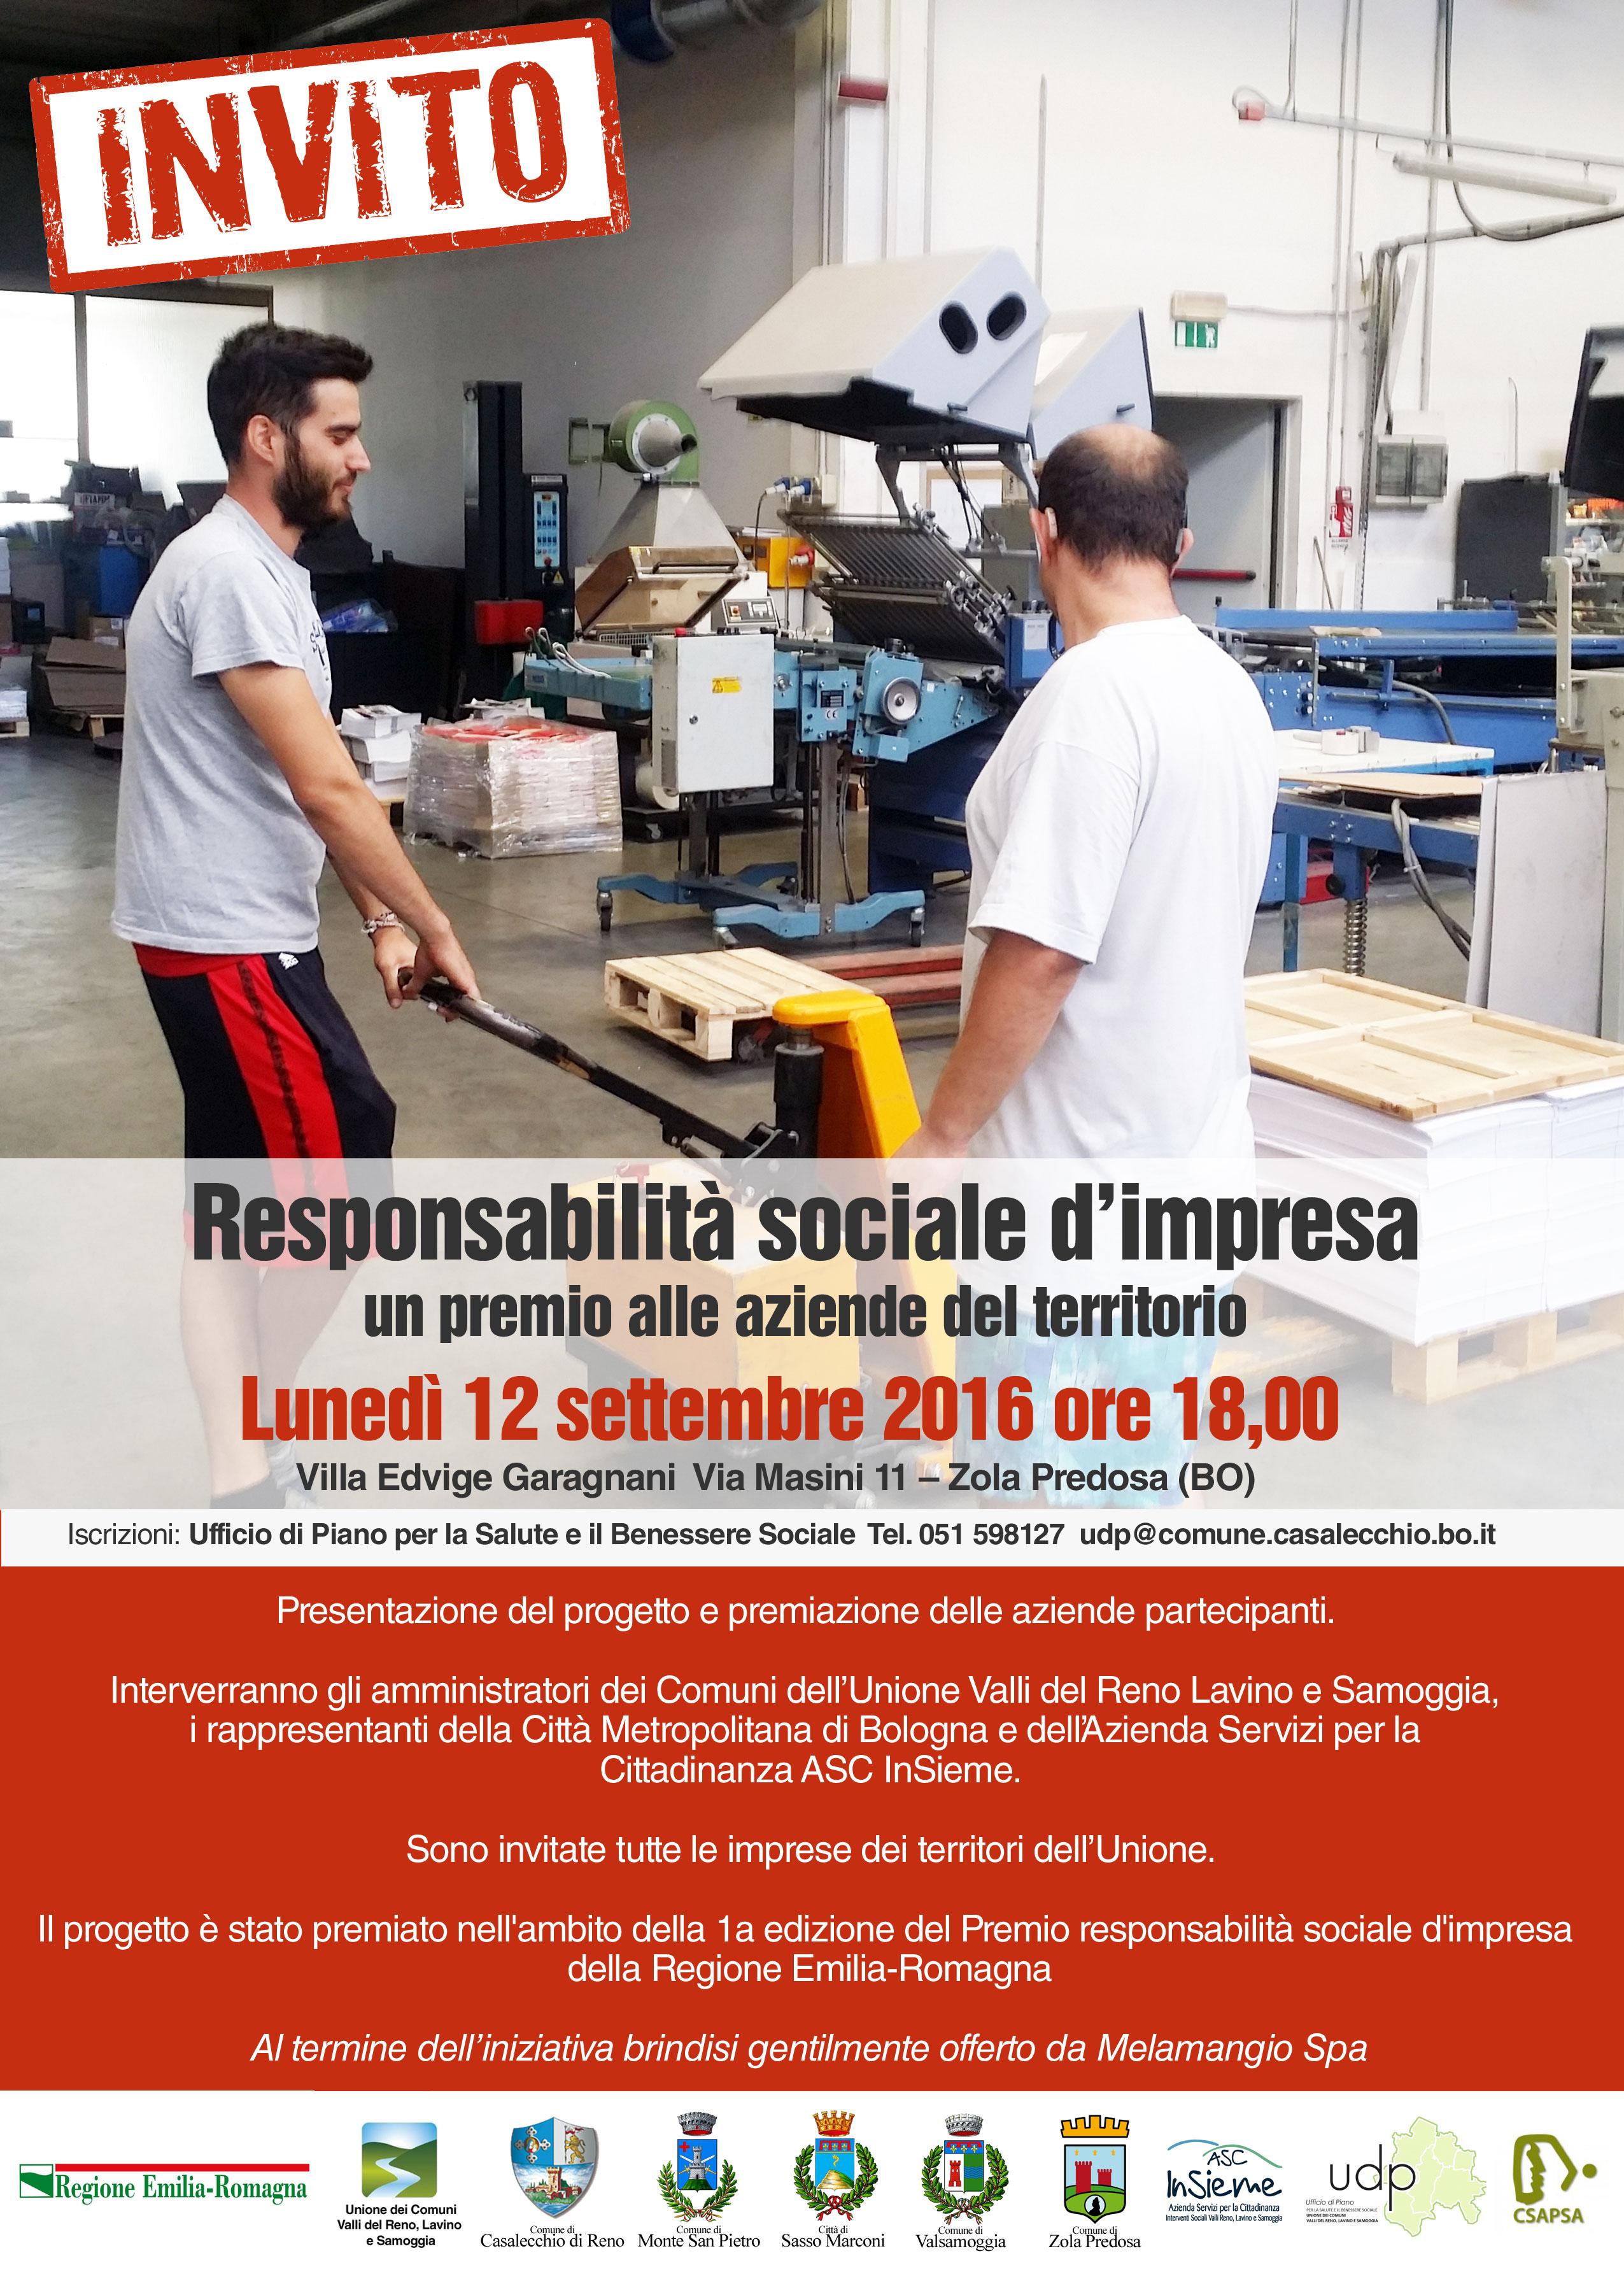 INVITO_PremioResponsabilitaSocialeImpresa.jpg